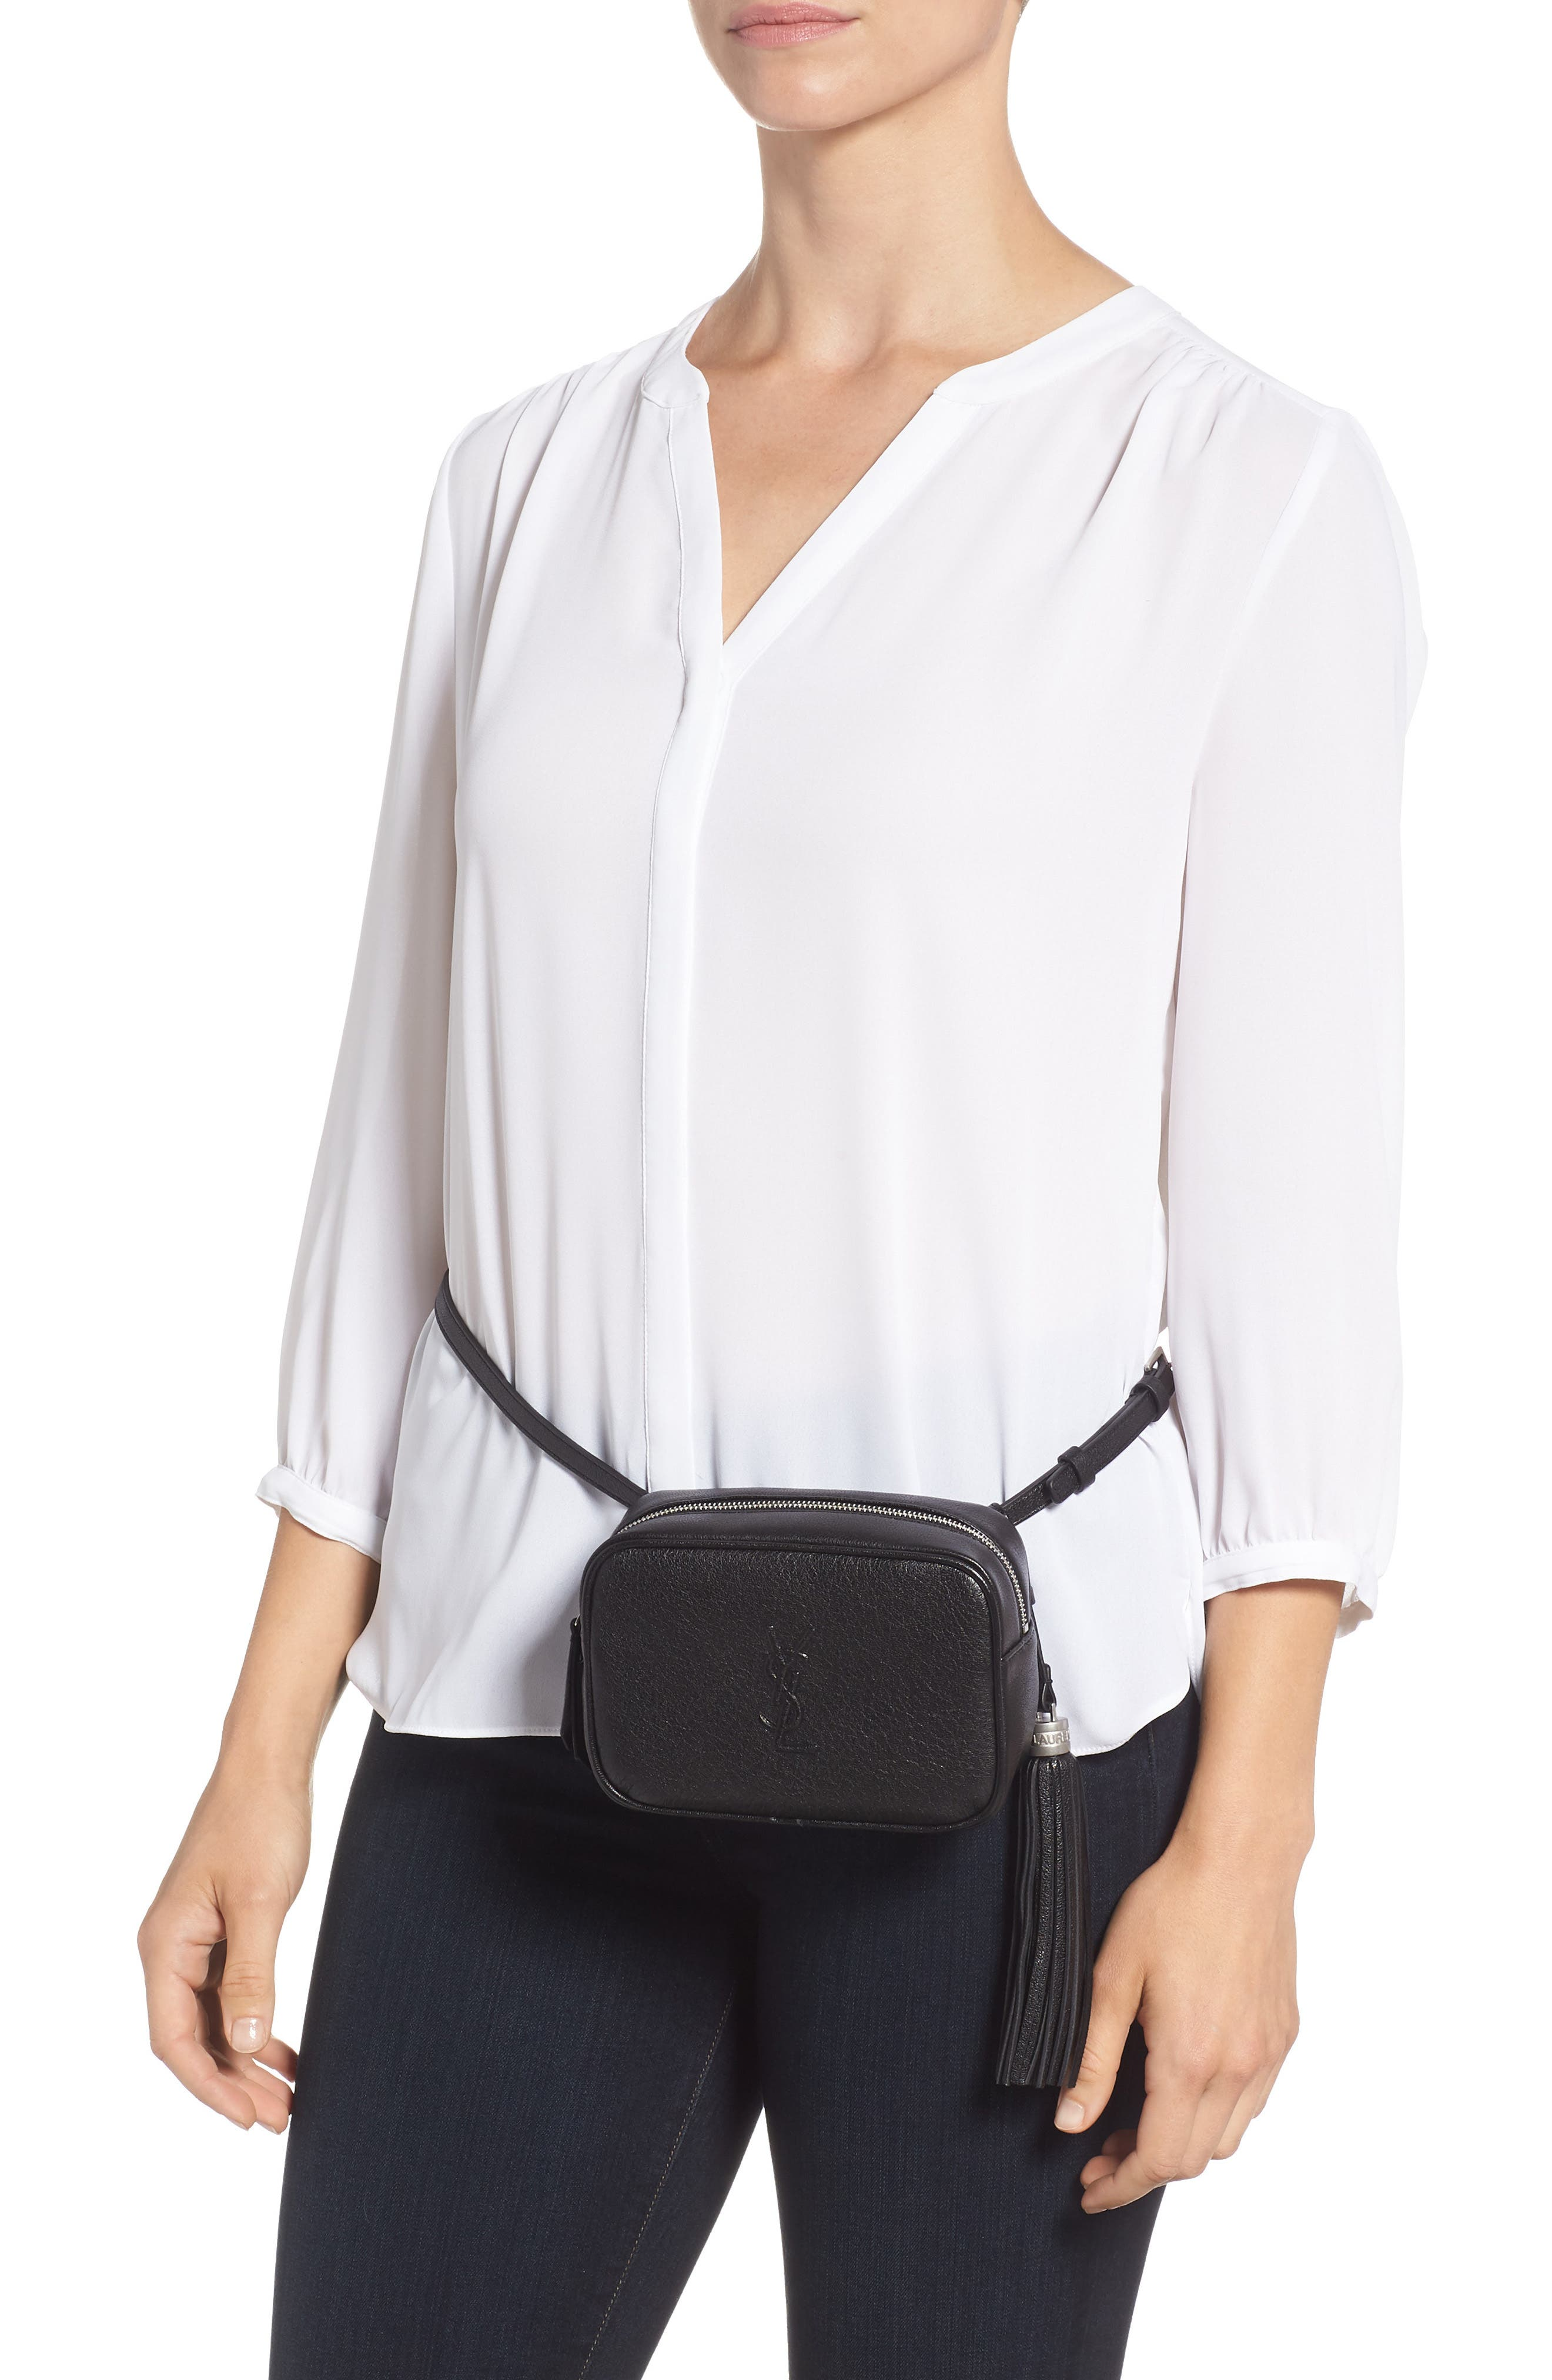 Loulou Tassel Leather Belt Bag,                             Alternate thumbnail 3, color,                             Noir